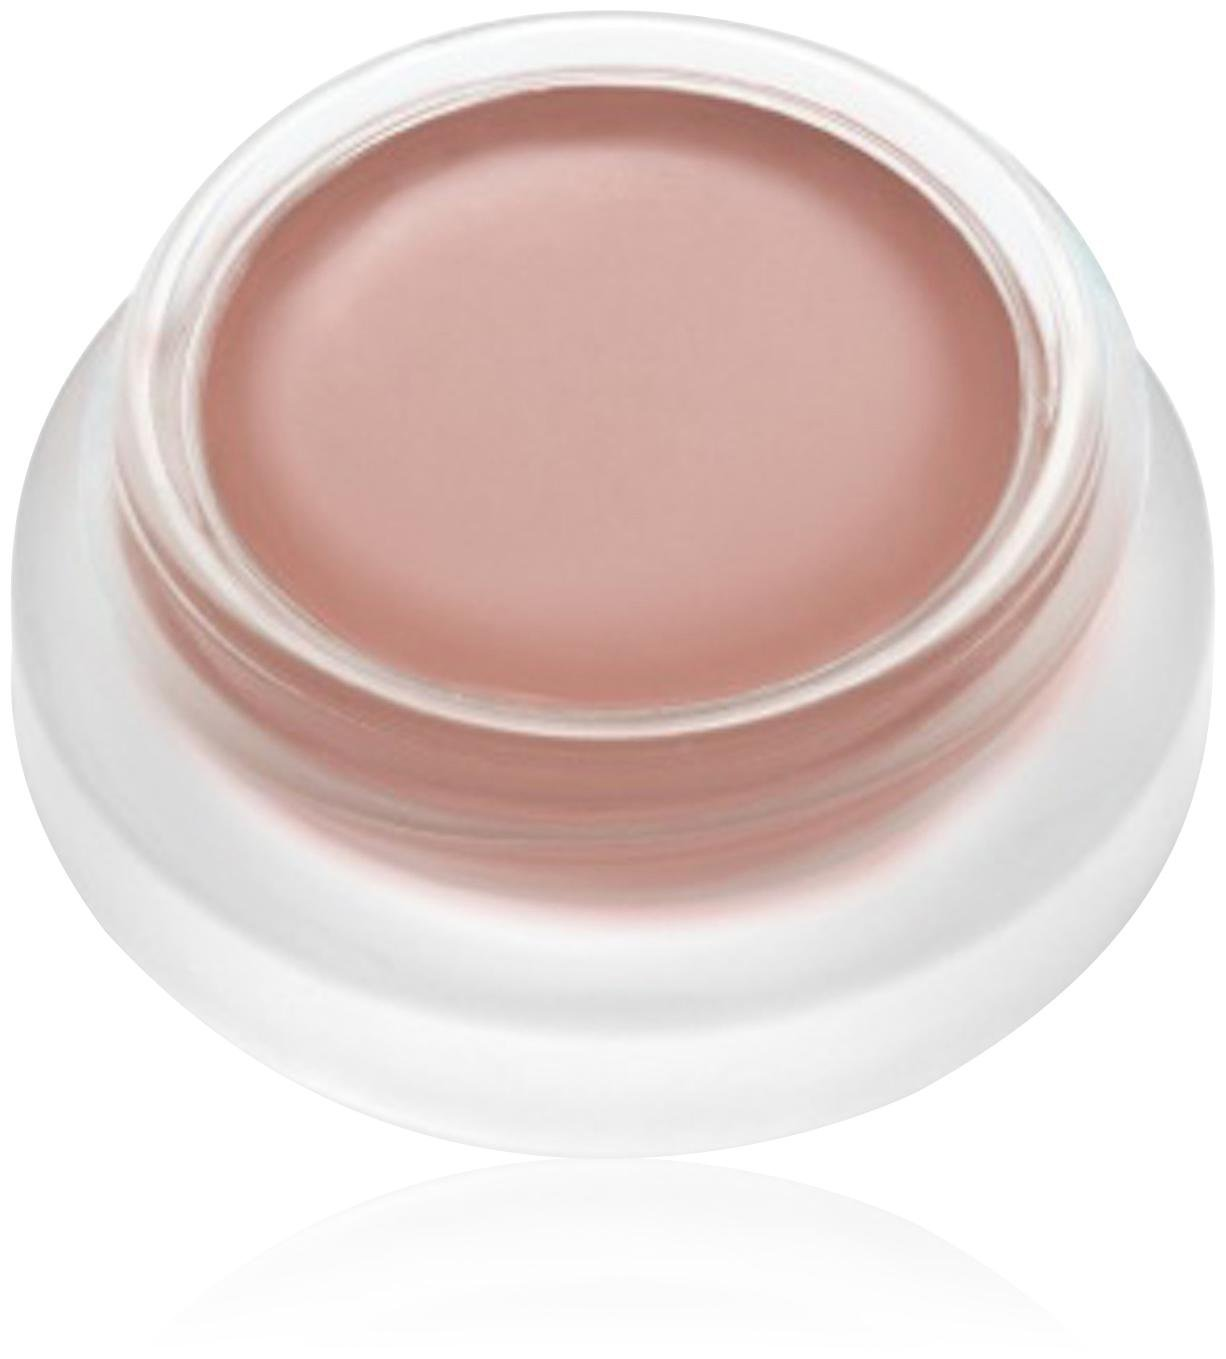 RMS Beauty Lip Shine - #Honest 5.67g/0.2oz